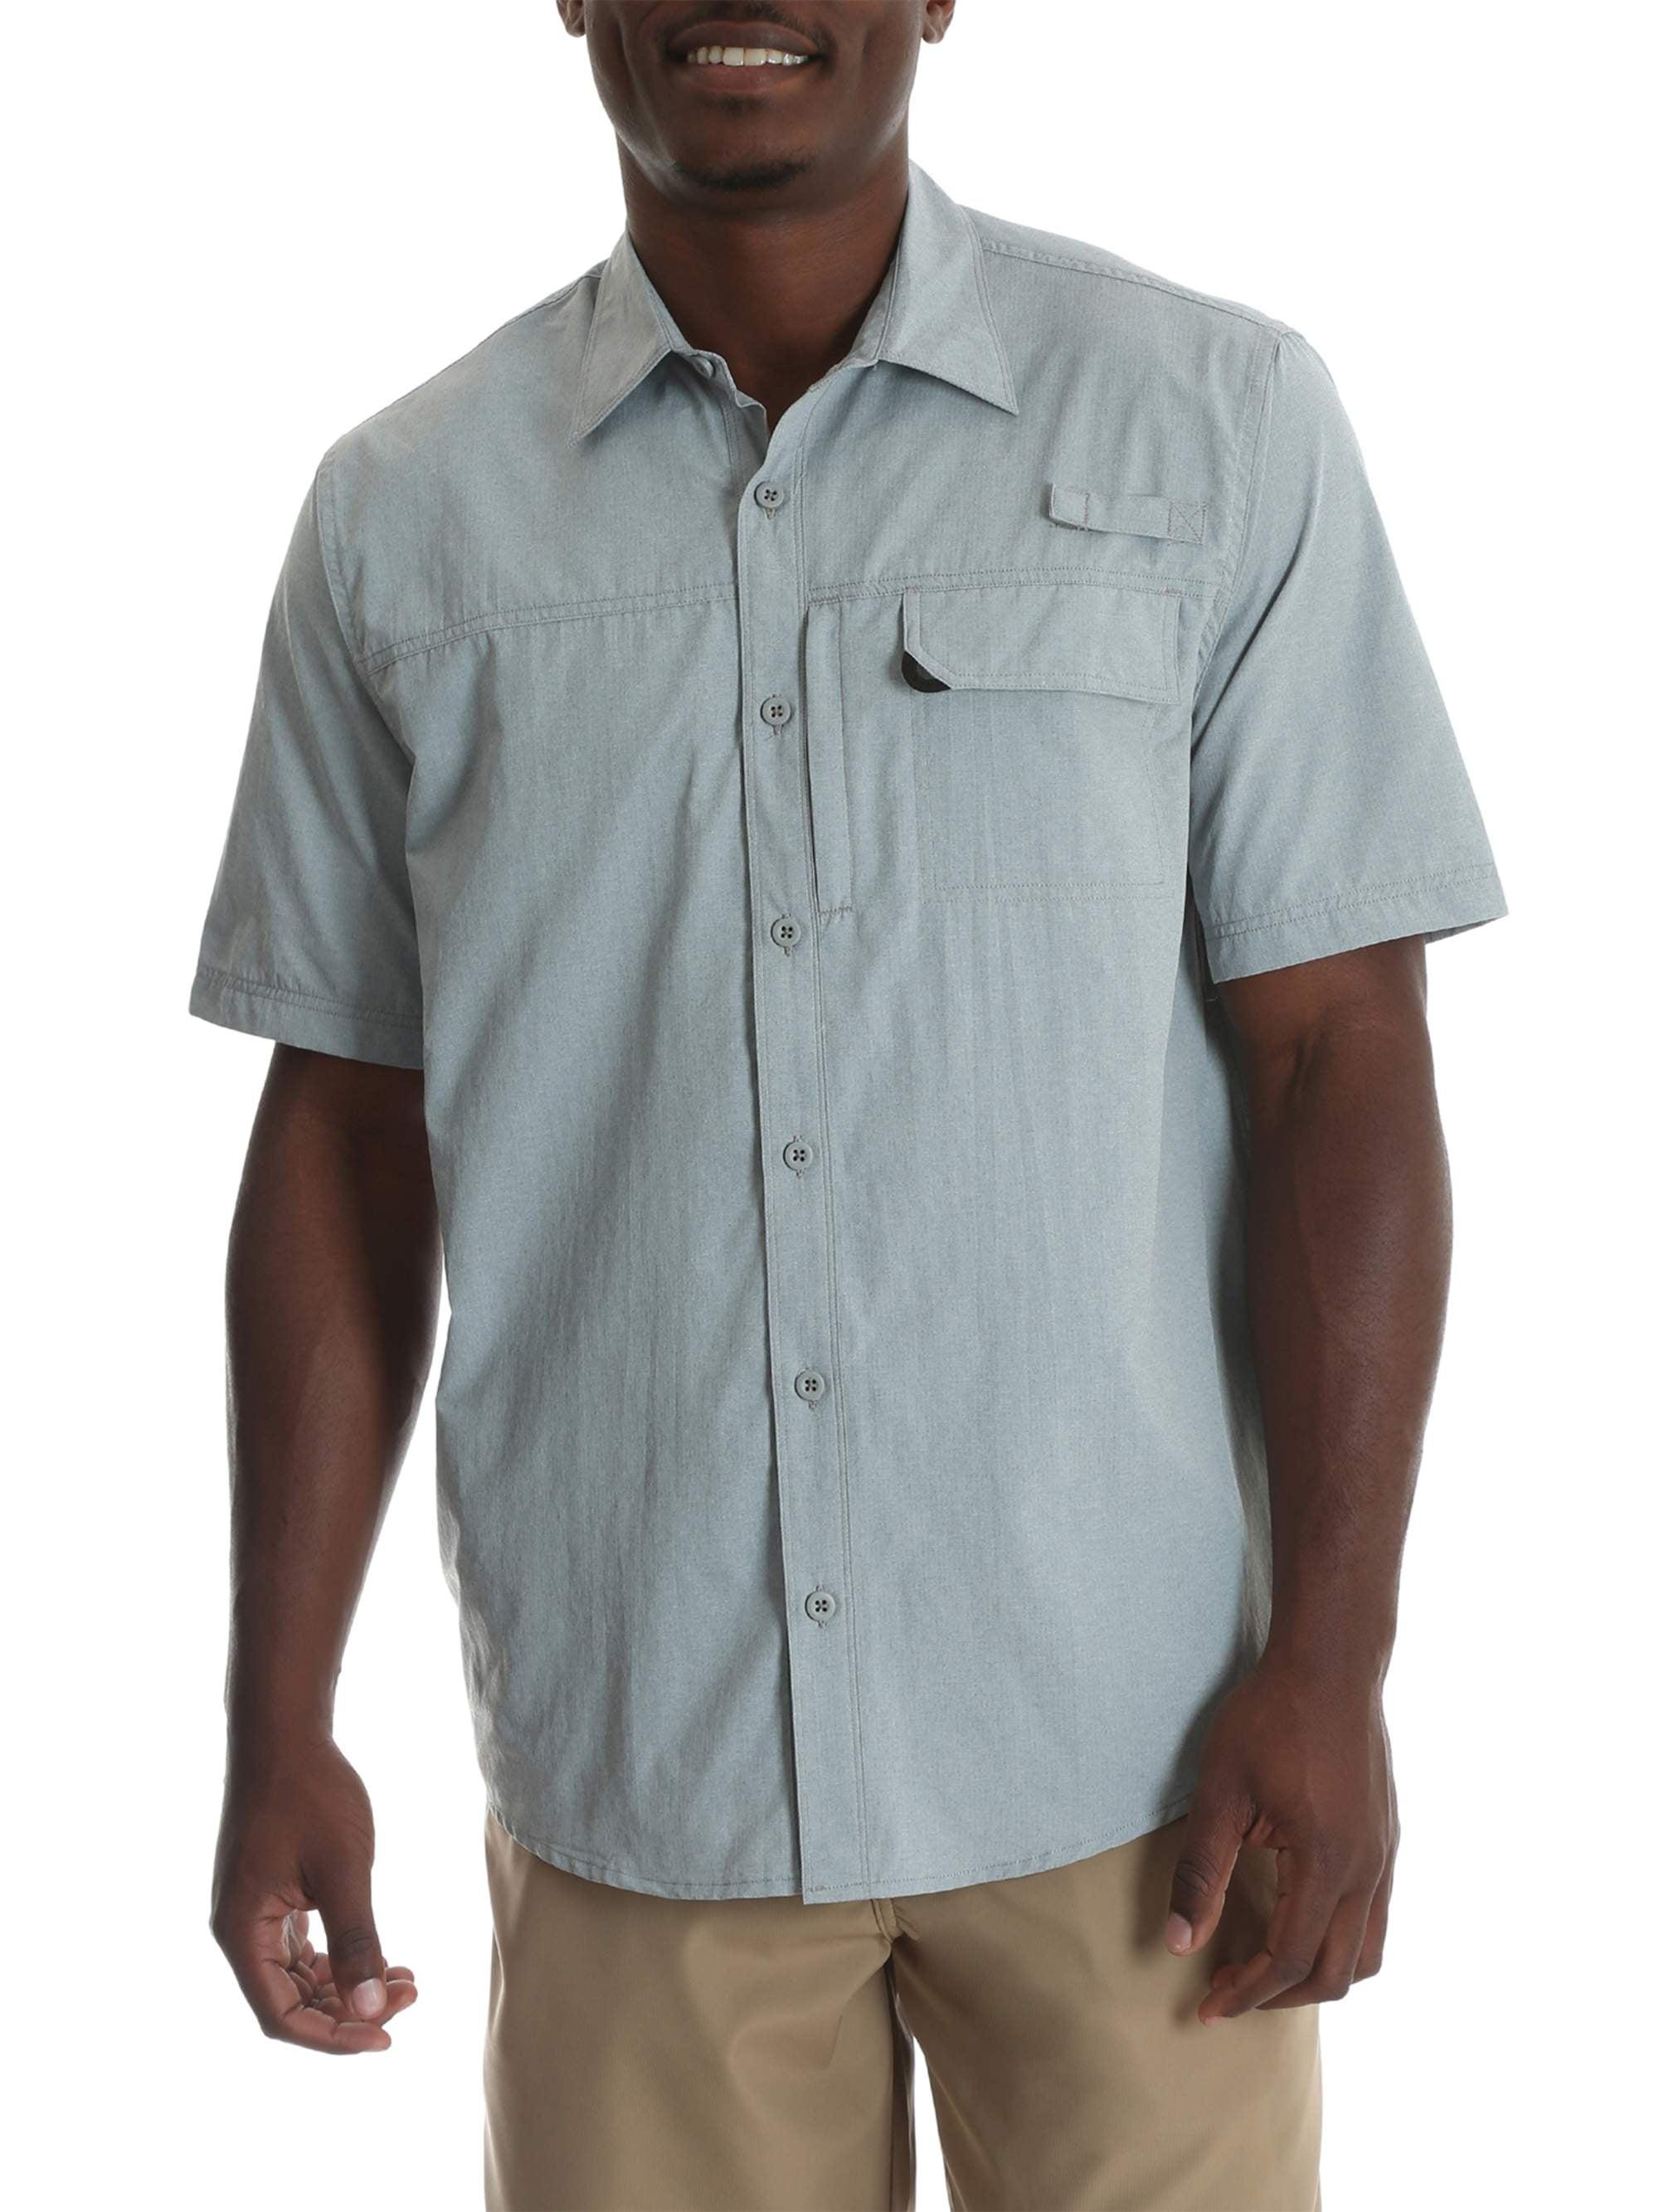 Wrangler 1 Pocket Button Down Shirt Powder Blue